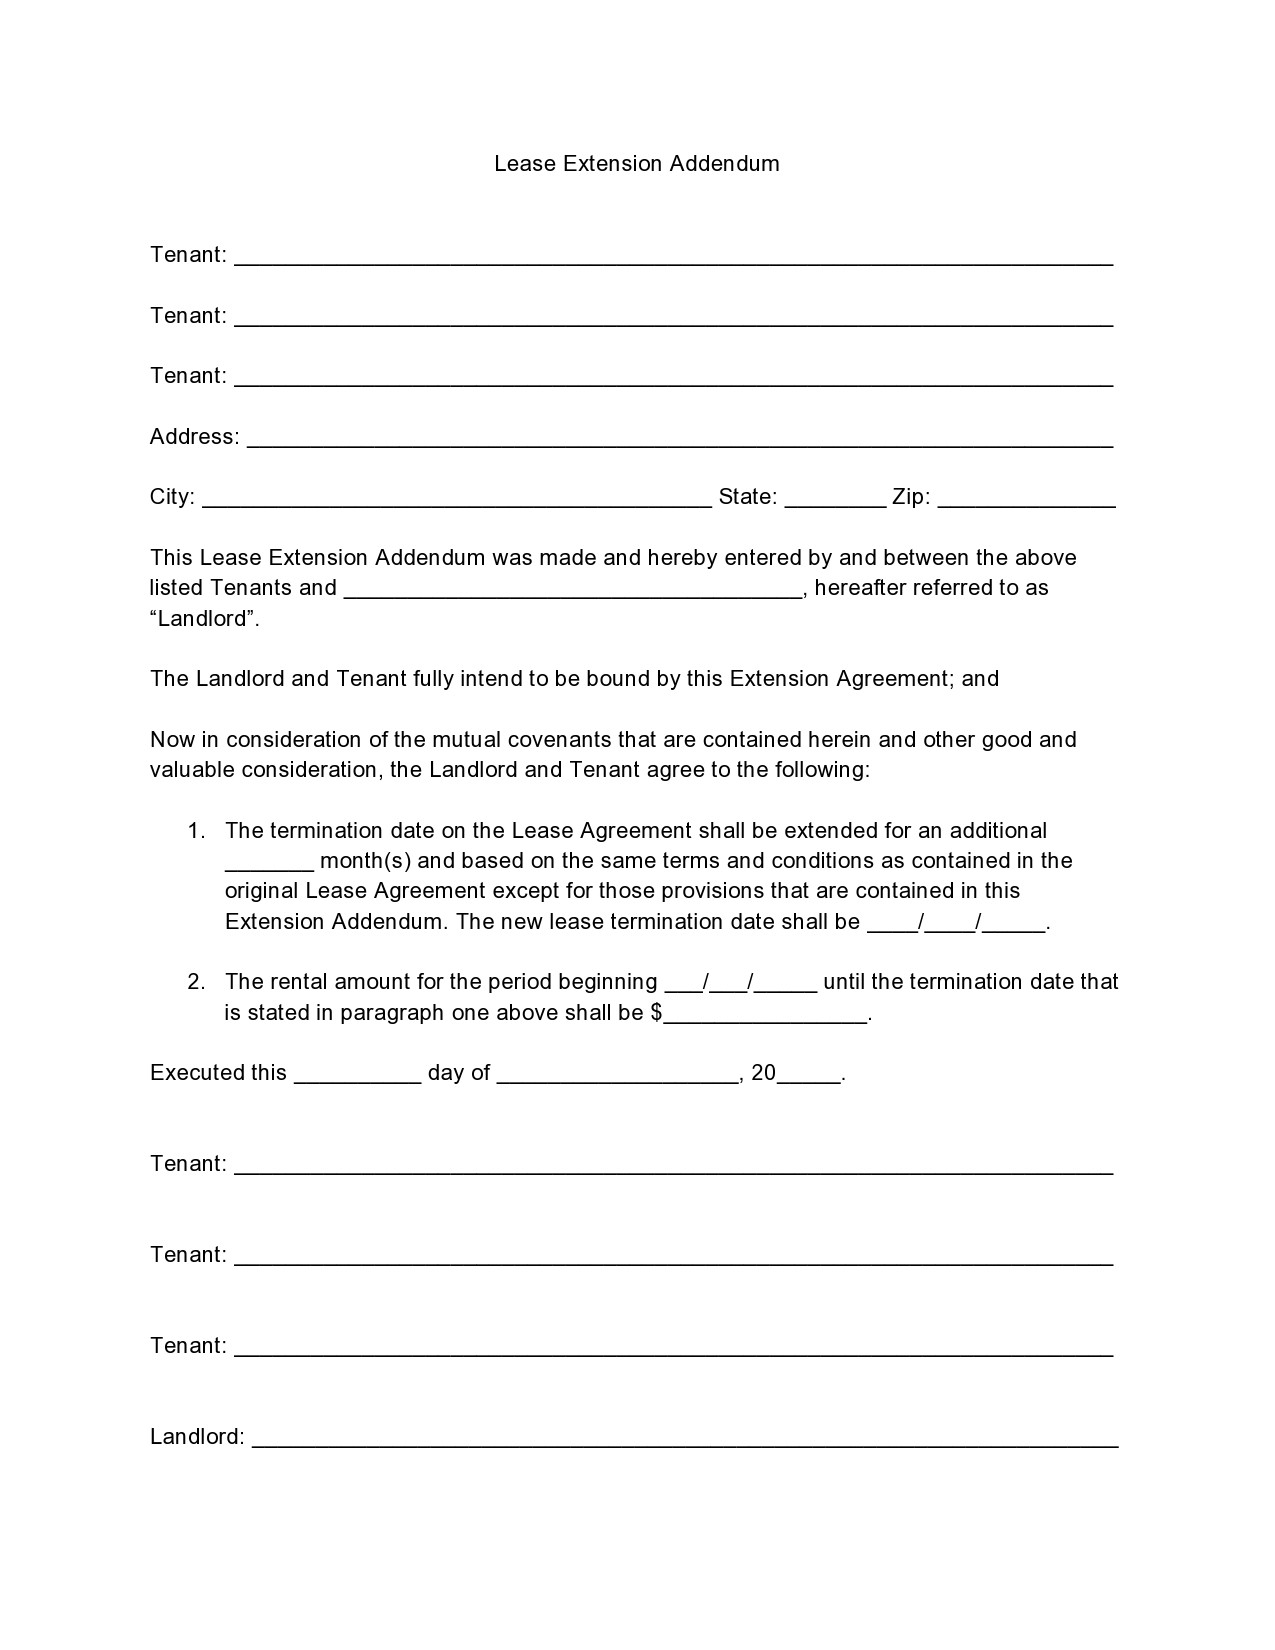 Free lease extension addendum 07